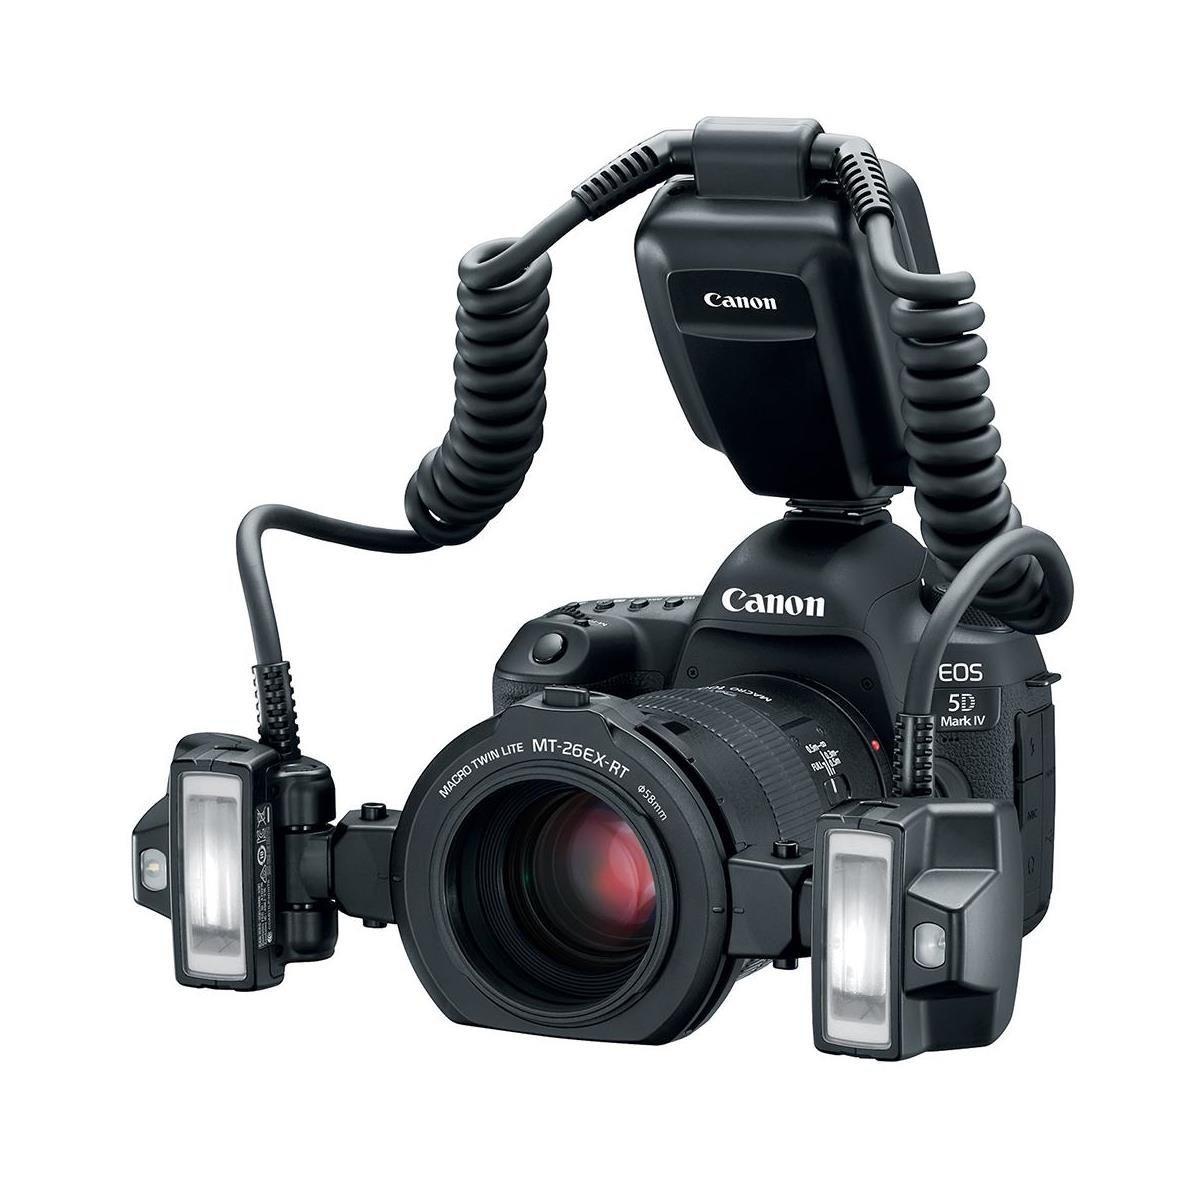 Canon MT-26EX-RT Macro Twin Lite Flash Unit USA Warranty With Accessory Bundle. by Canon (Image #2)